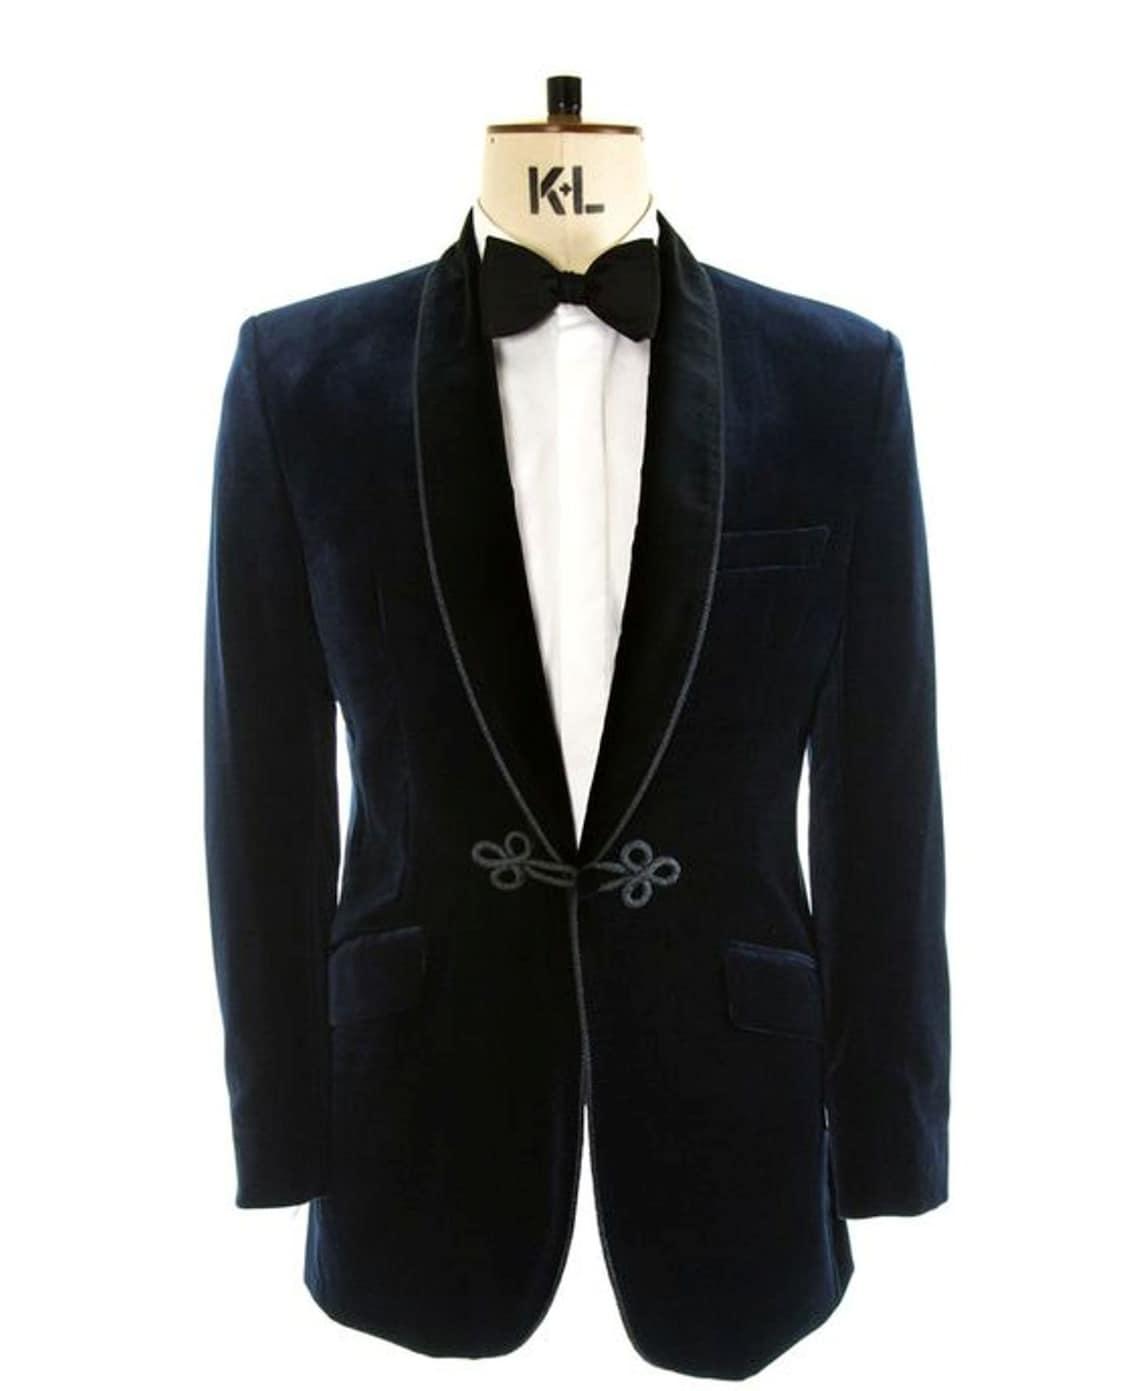 1920s Men's Evening Wear History: Tuxedos to Tailcoats Mens Velvet Blazer Handmade Blue Smoking Jacket Christmas Evening Party Wear Wedding Dinner Tuxedo Coat Gift  AT vintagedancer.com